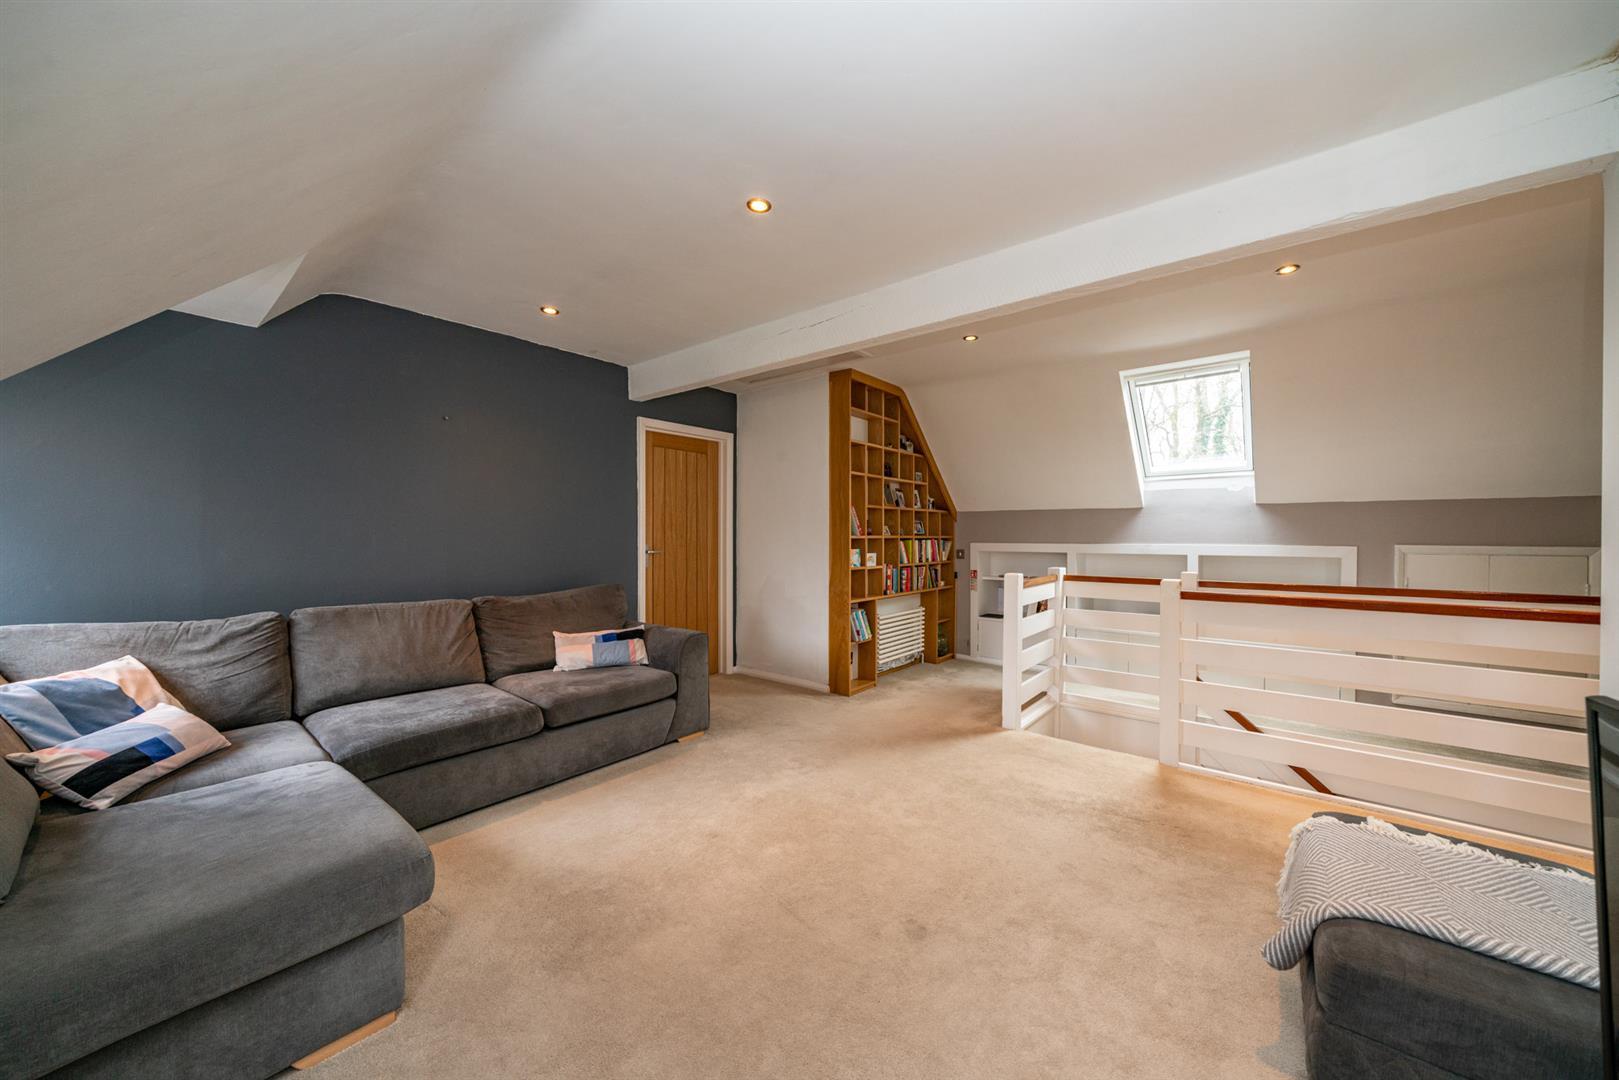 Flat-6-Ruscoe-5115-  living room 3.jpg